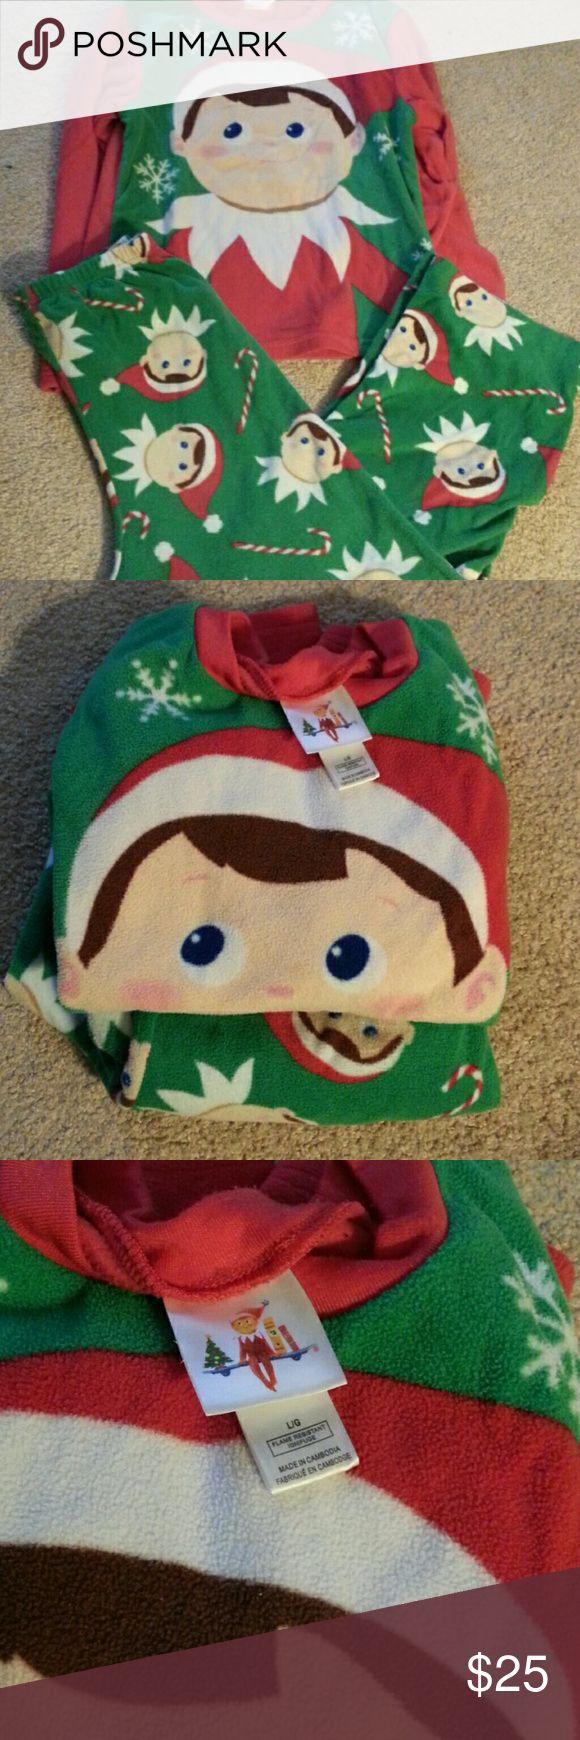 Elf on the shelf boys PJs Like new. Fleece material. Size says large, they fit a boys 10-12 Pajamas Pajama Sets